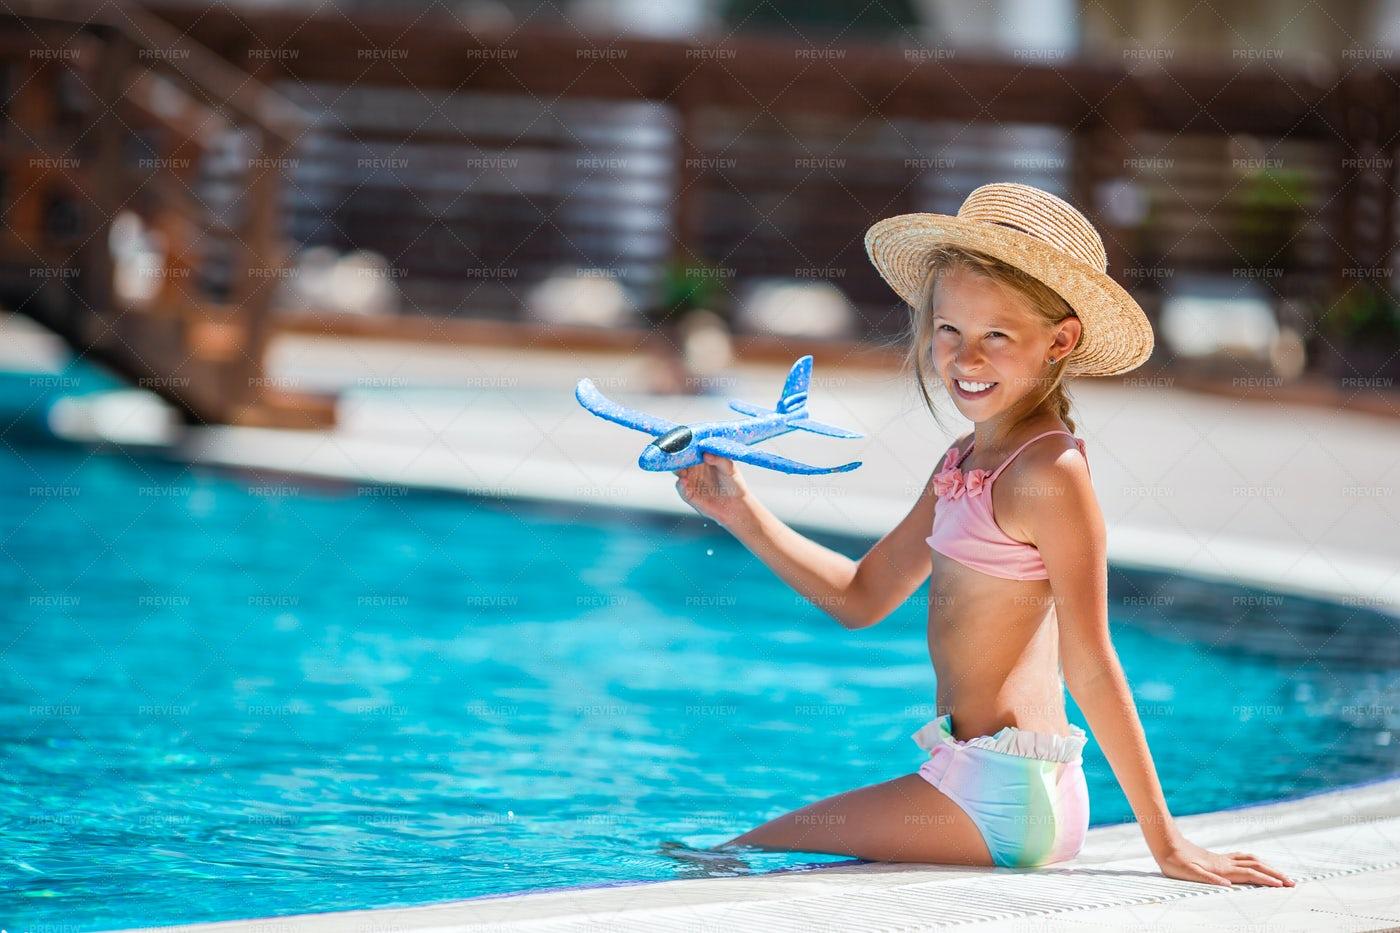 Kid With Toy Plane: Stock Photos